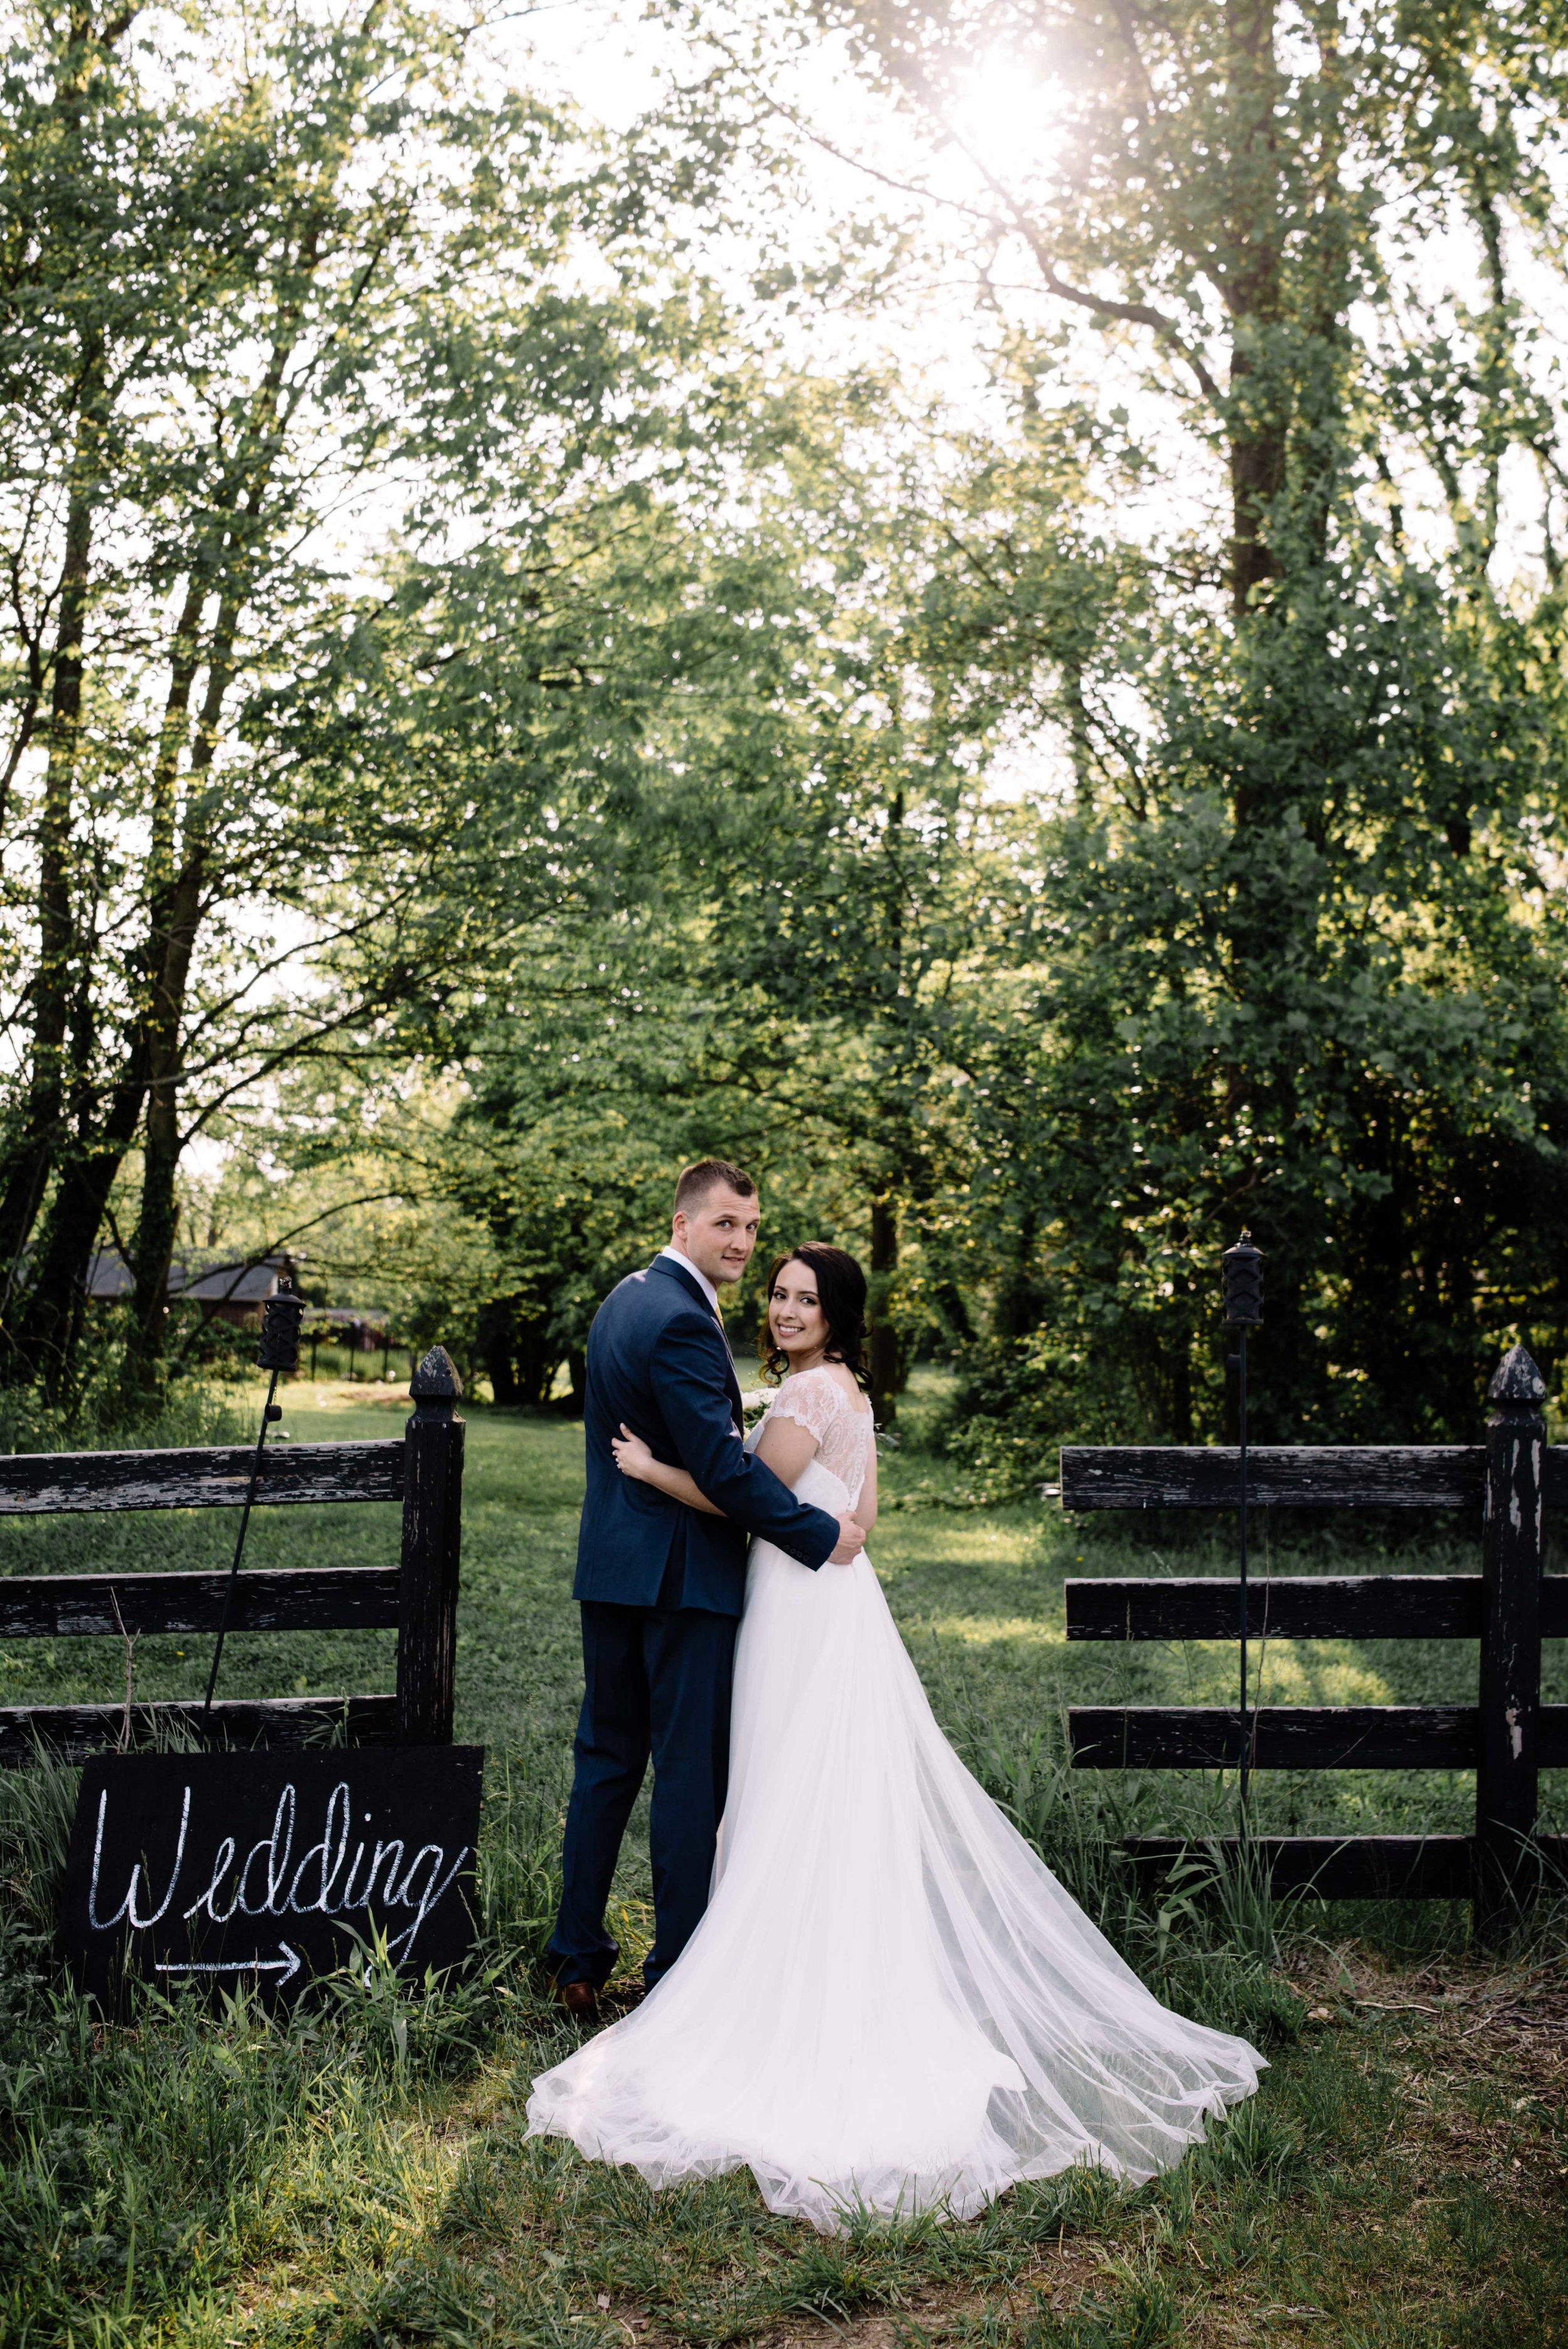 Ana-Dan-Blog-Indianapolis-Wedding-66.jpg